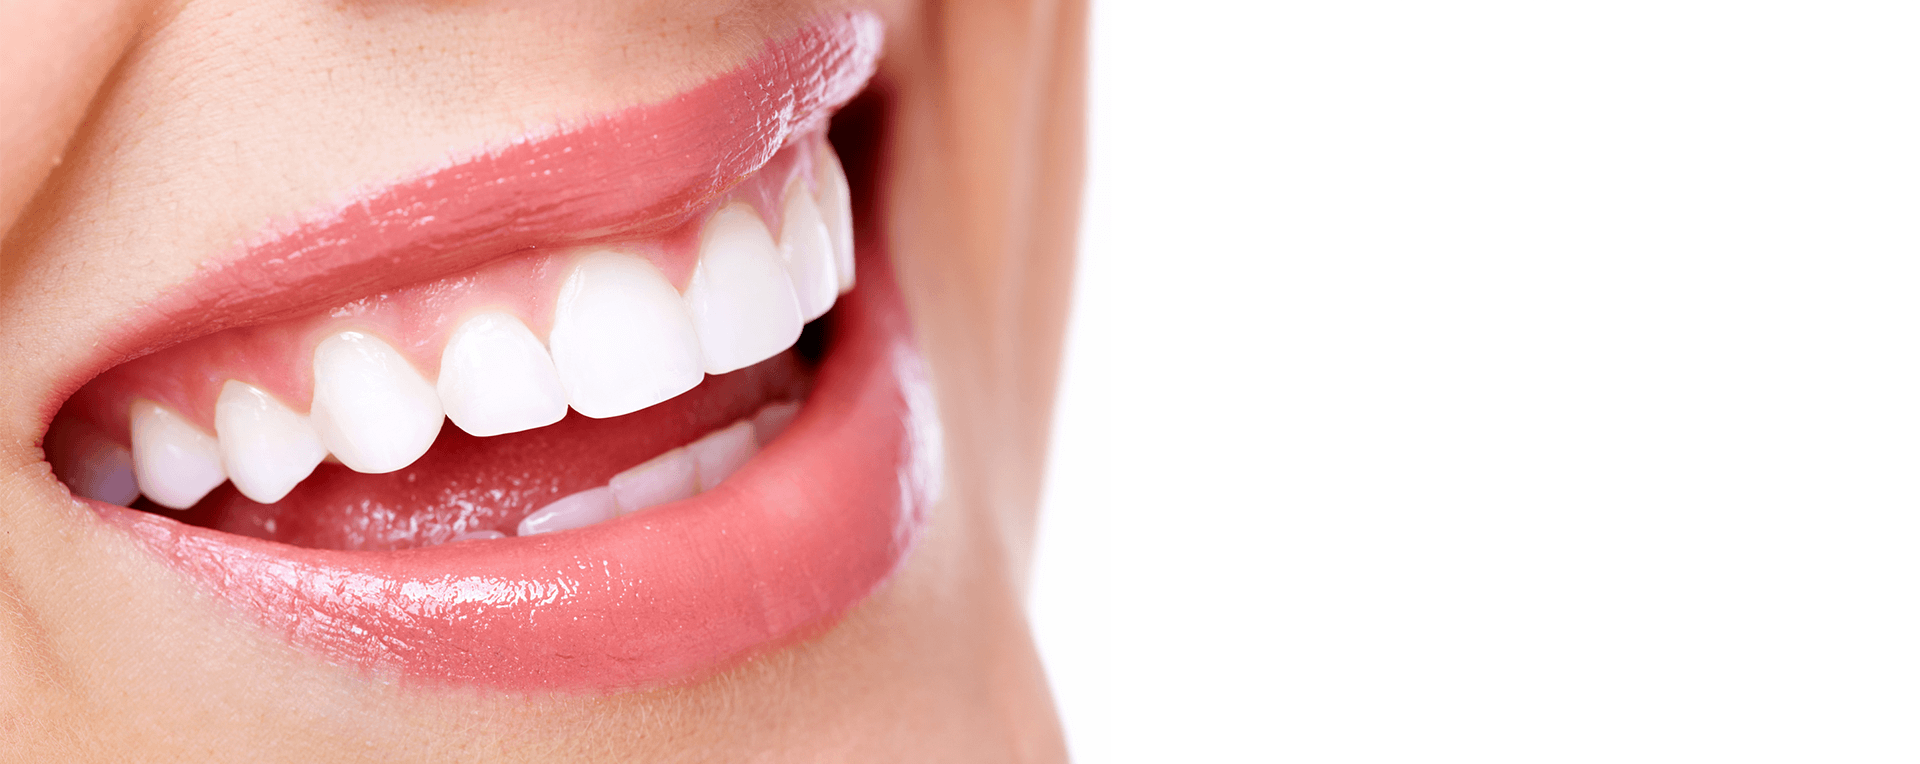 Teeth Smile Png Hd - Teeth Hd Png Pluspng Pluspng Pluspng.com 1920   Teeth Hd Png   Png, Transparent background PNG HD thumbnail